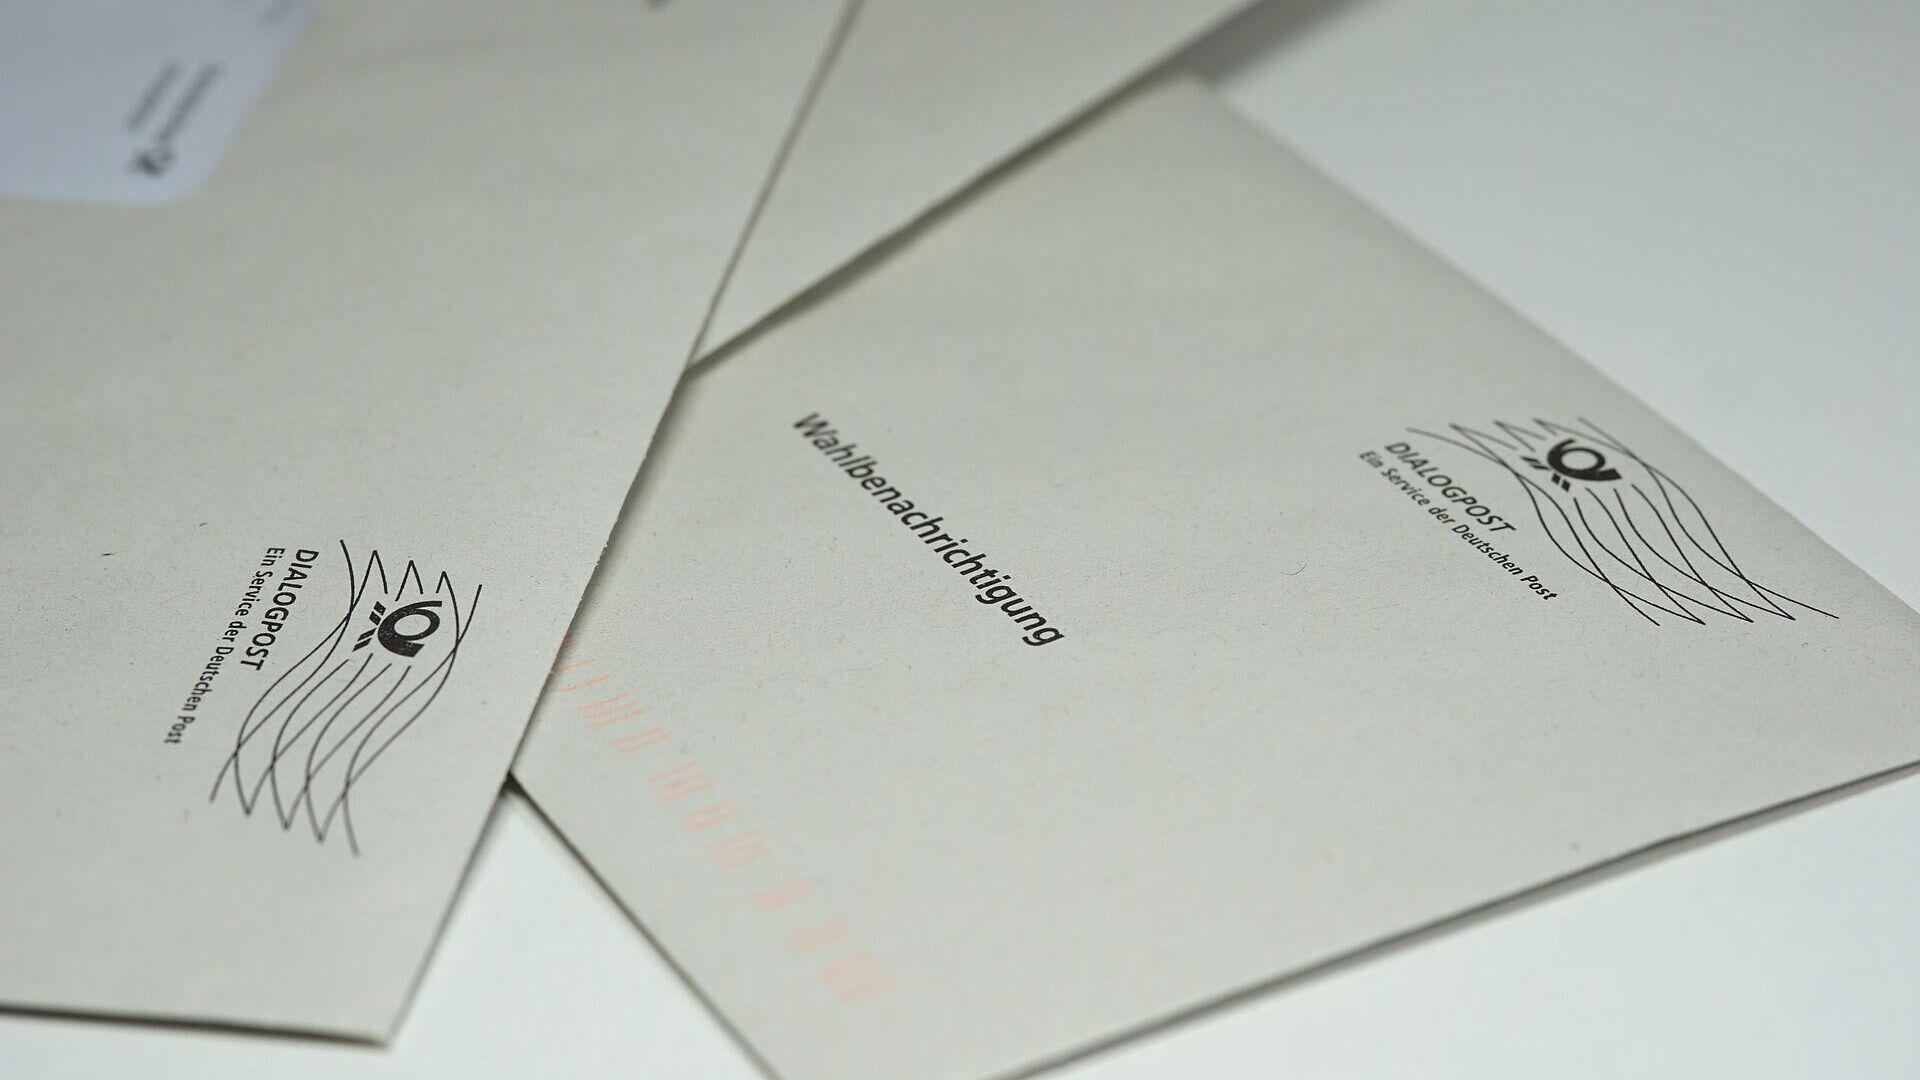 Briefwahl (Symboöbild) - SNA, 1920, 28.09.2021